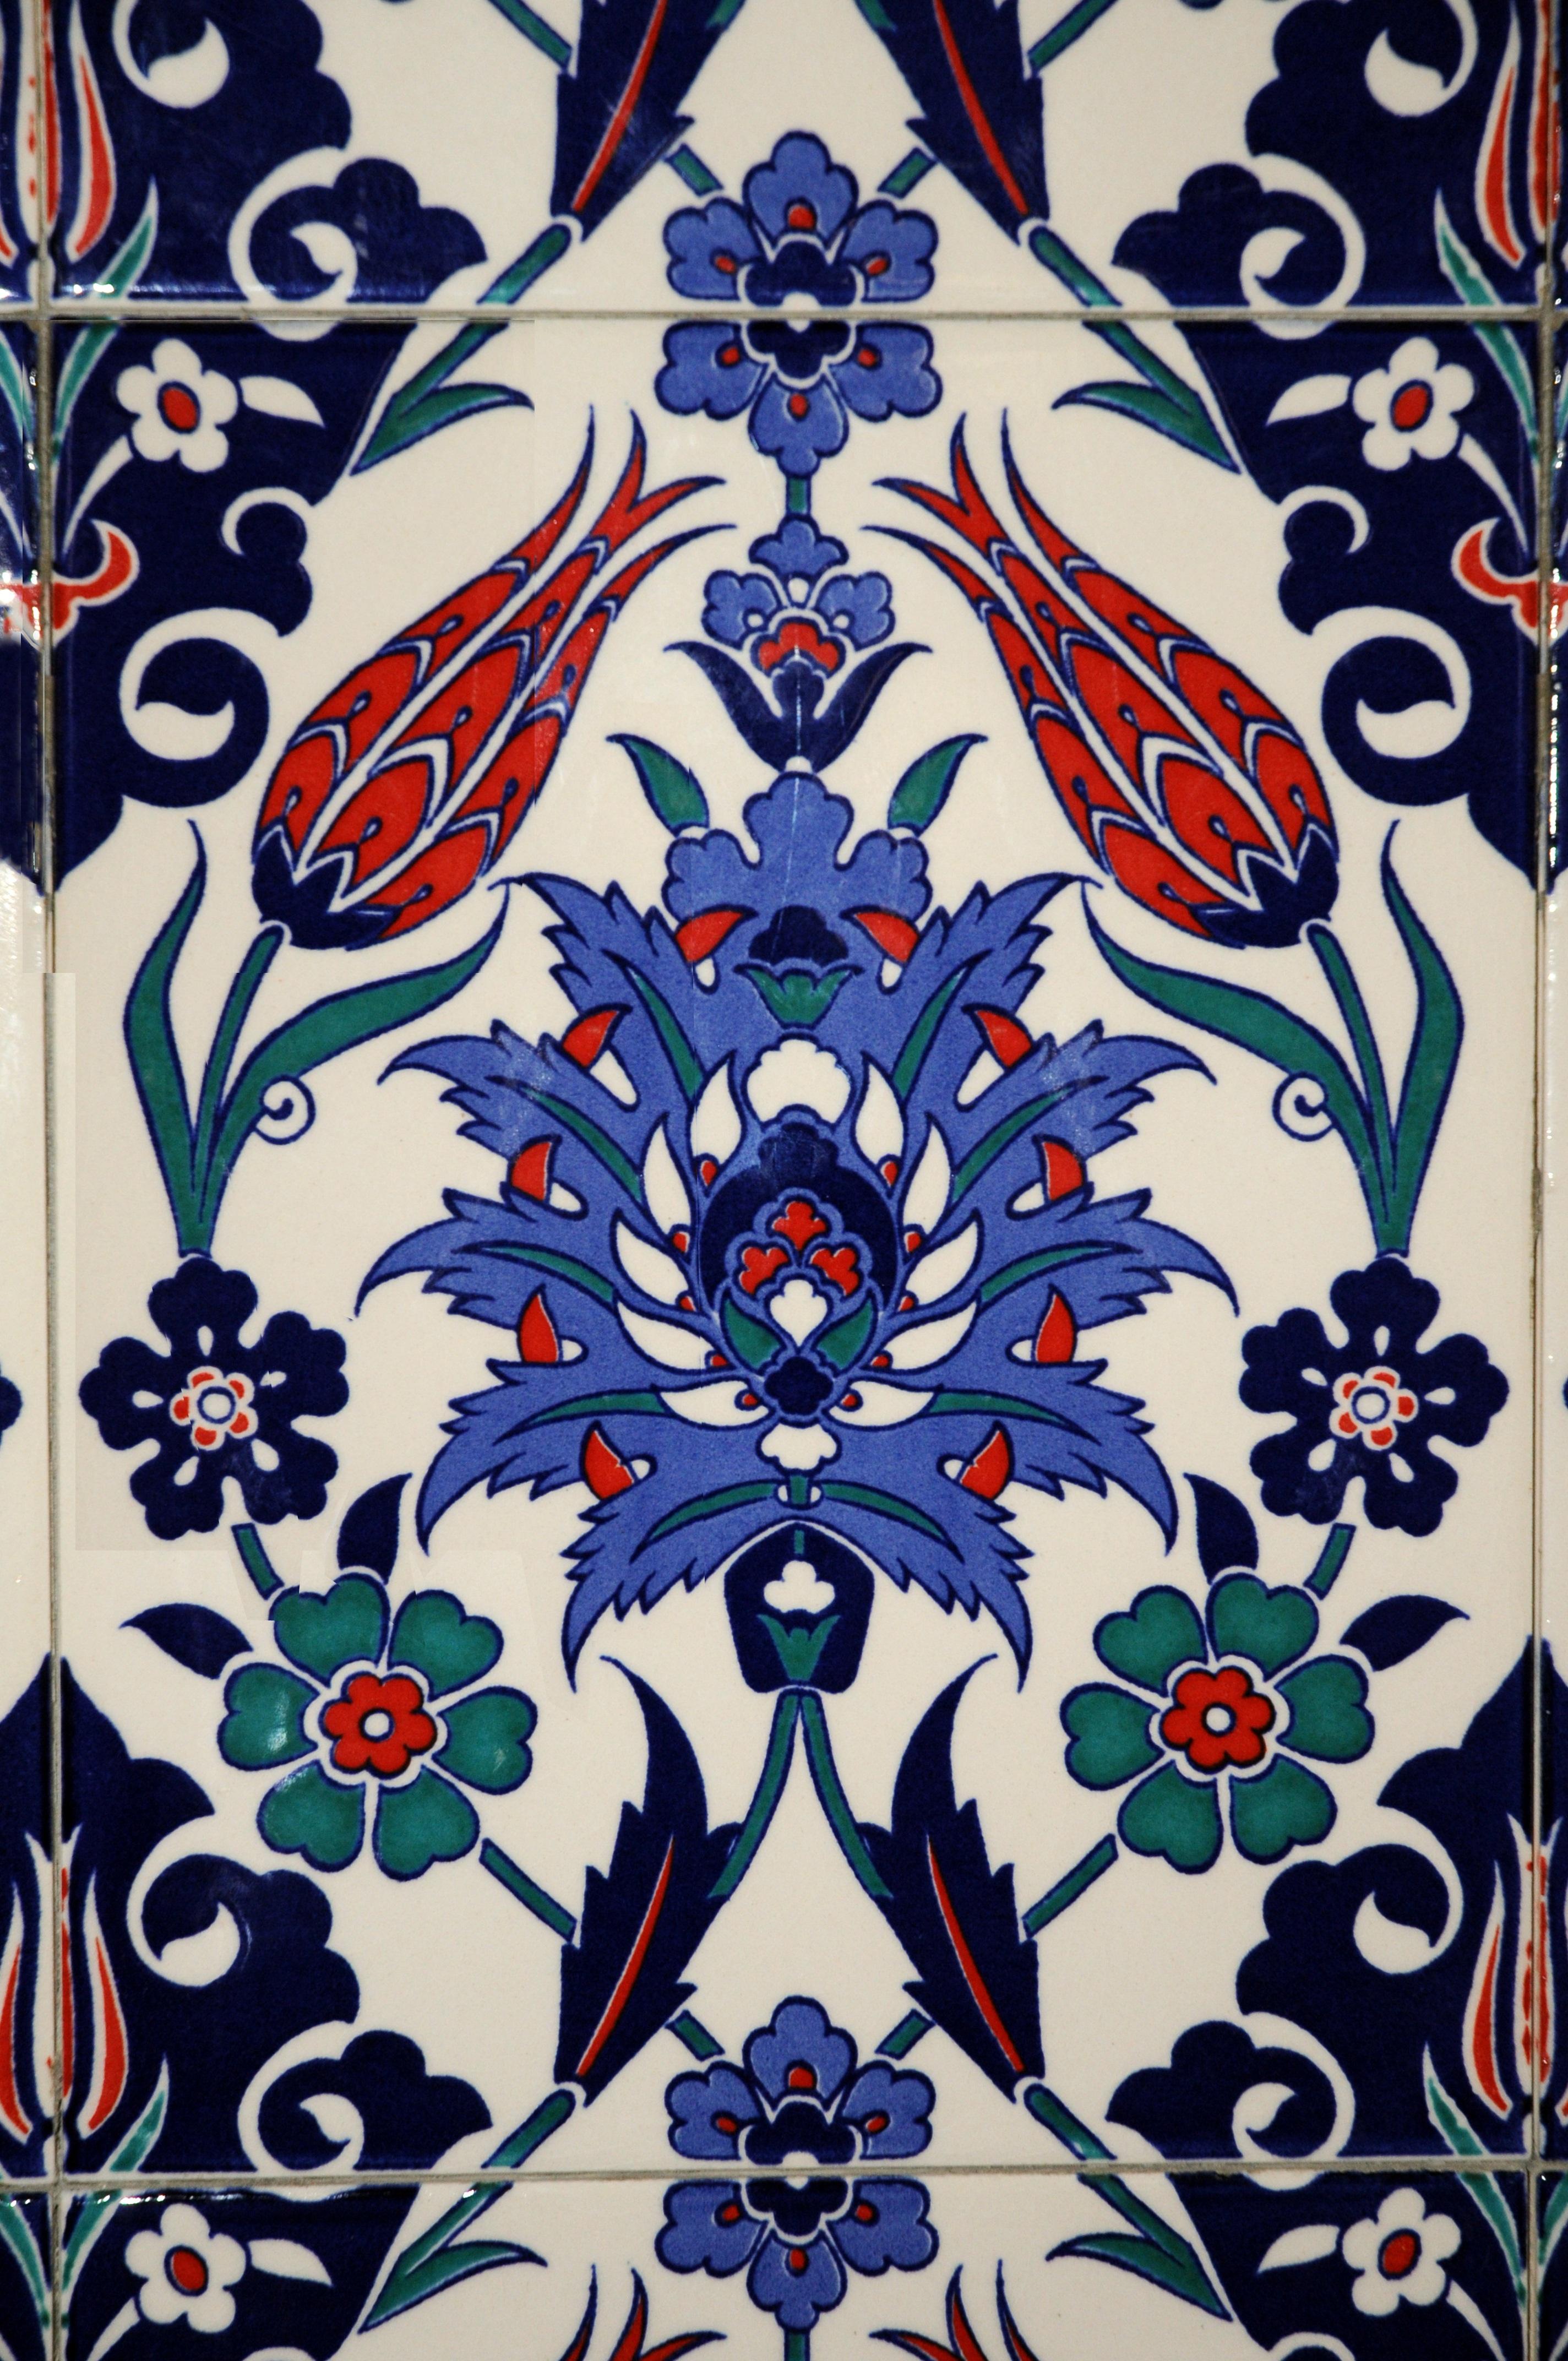 Symmetry Furniture free images : window, pattern, ceramic, tile, blue, furniture